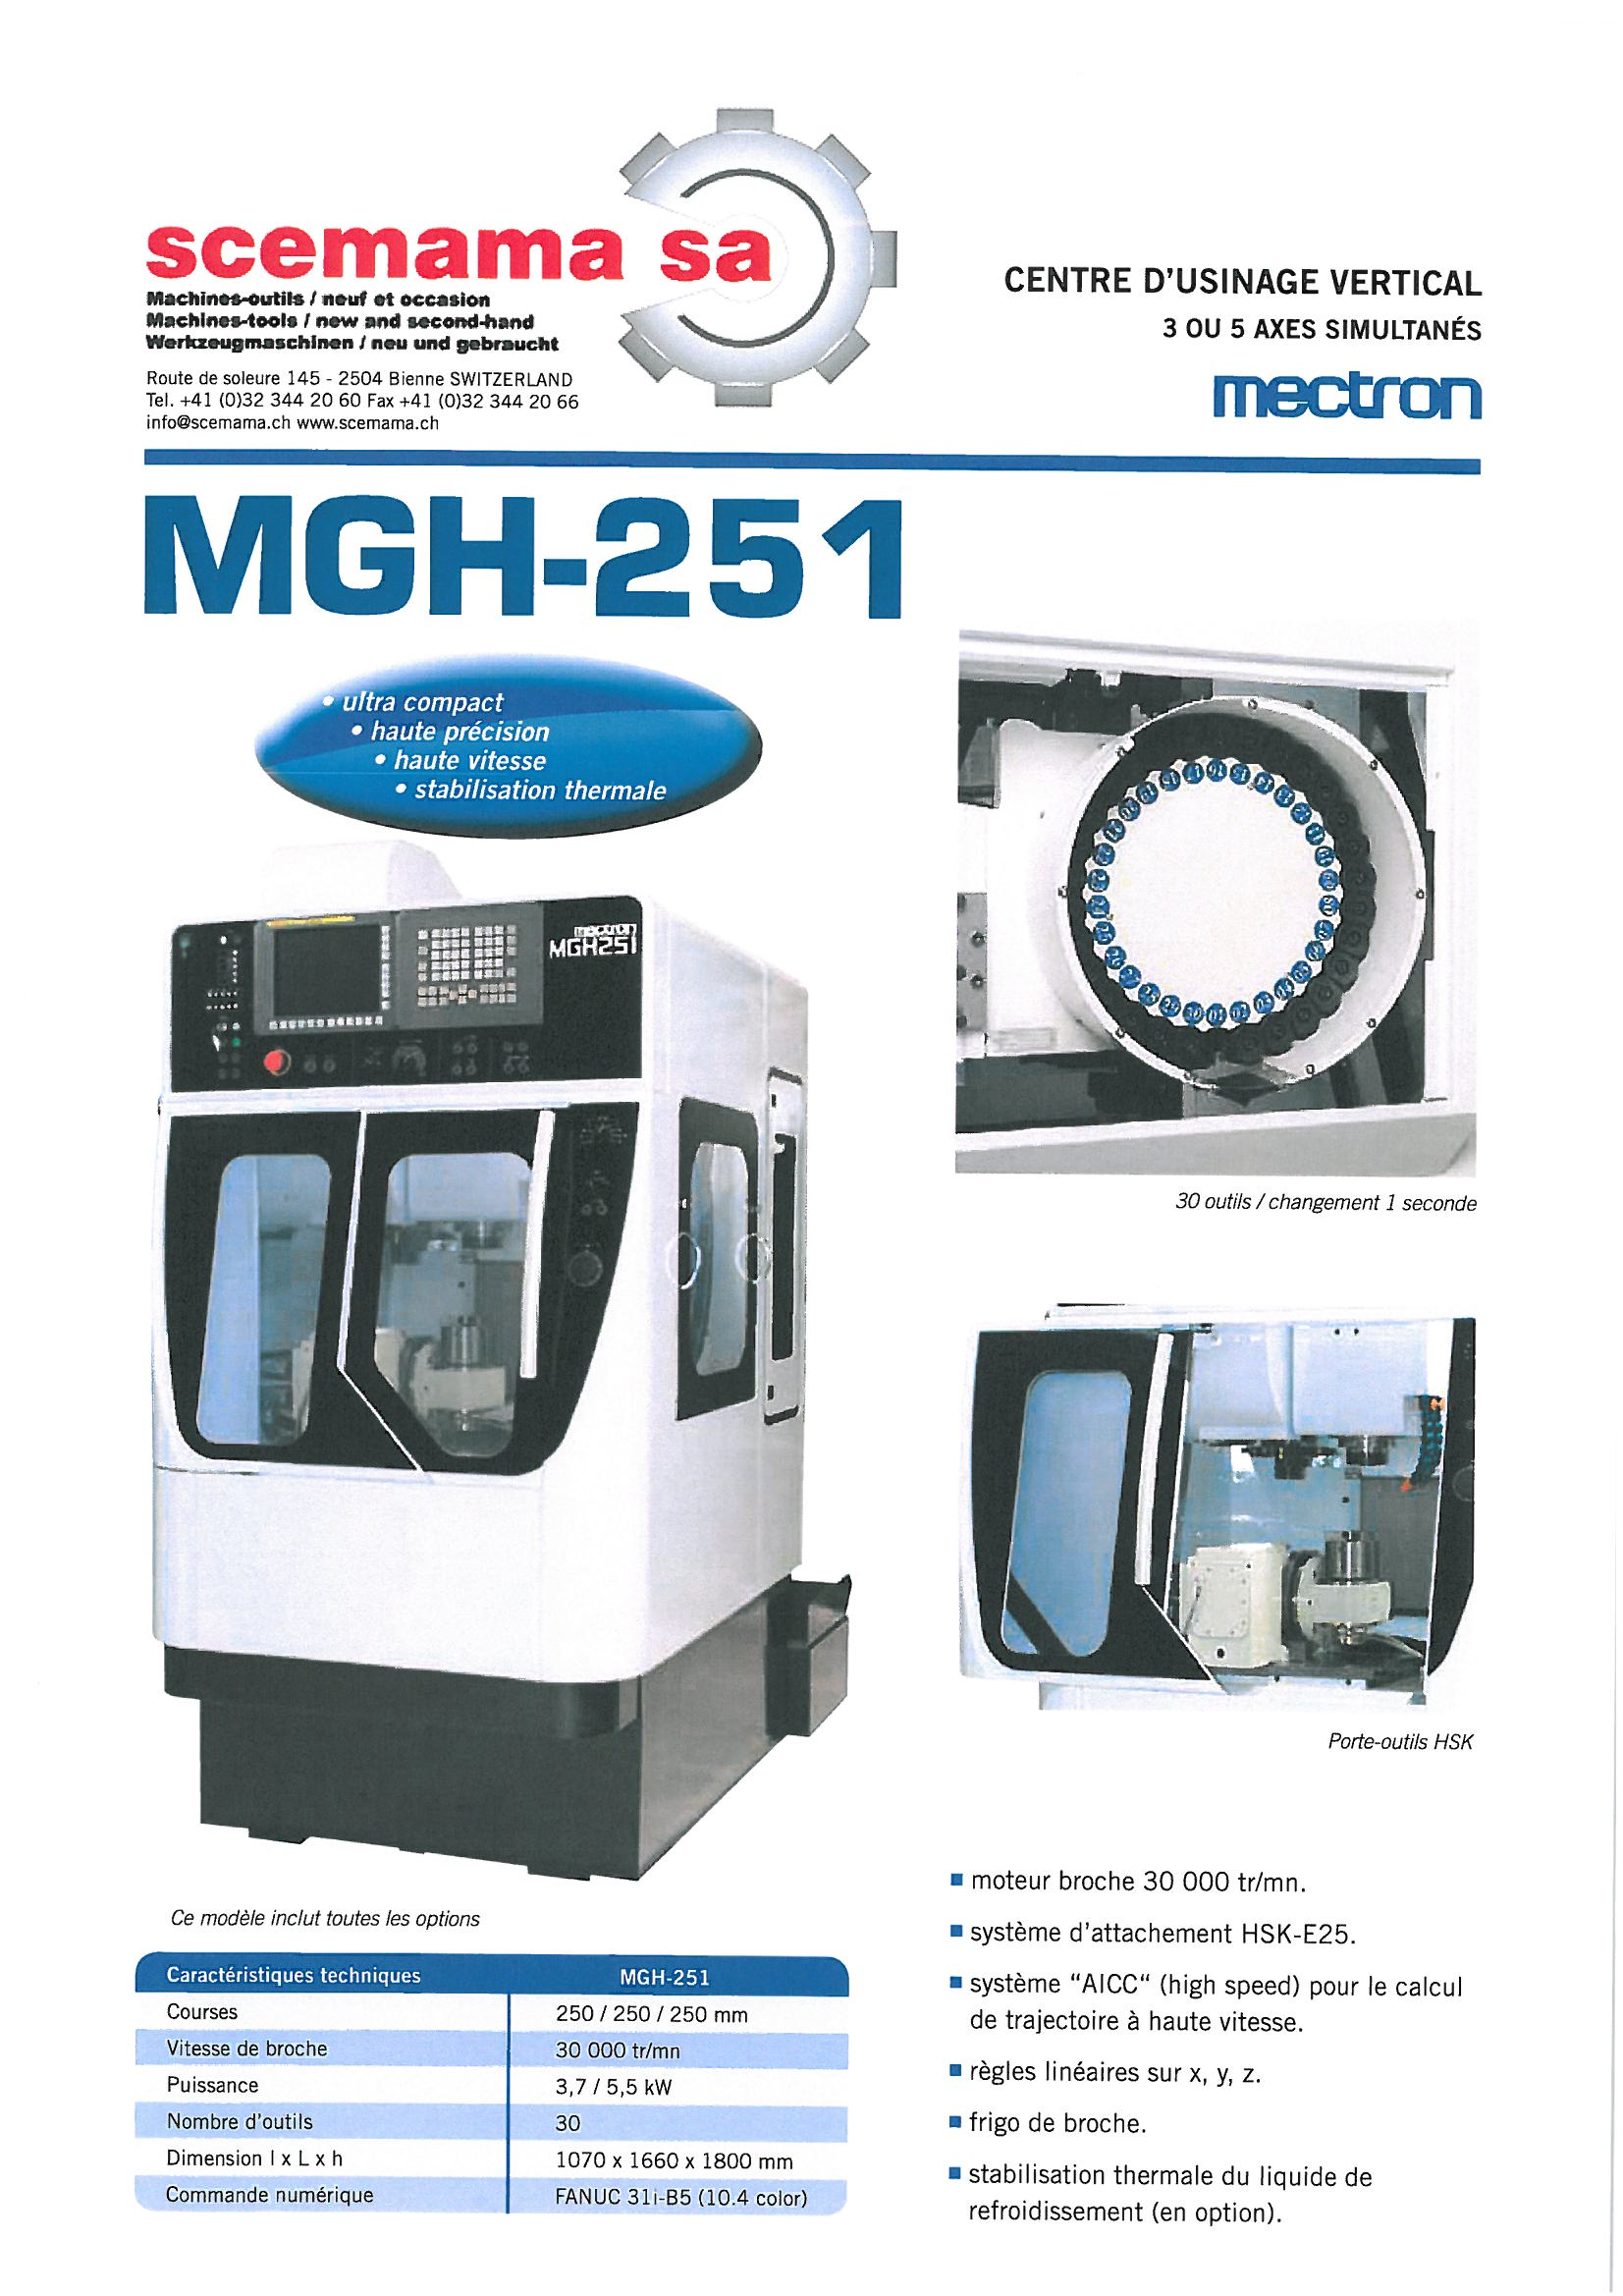 Mectron MGH-251